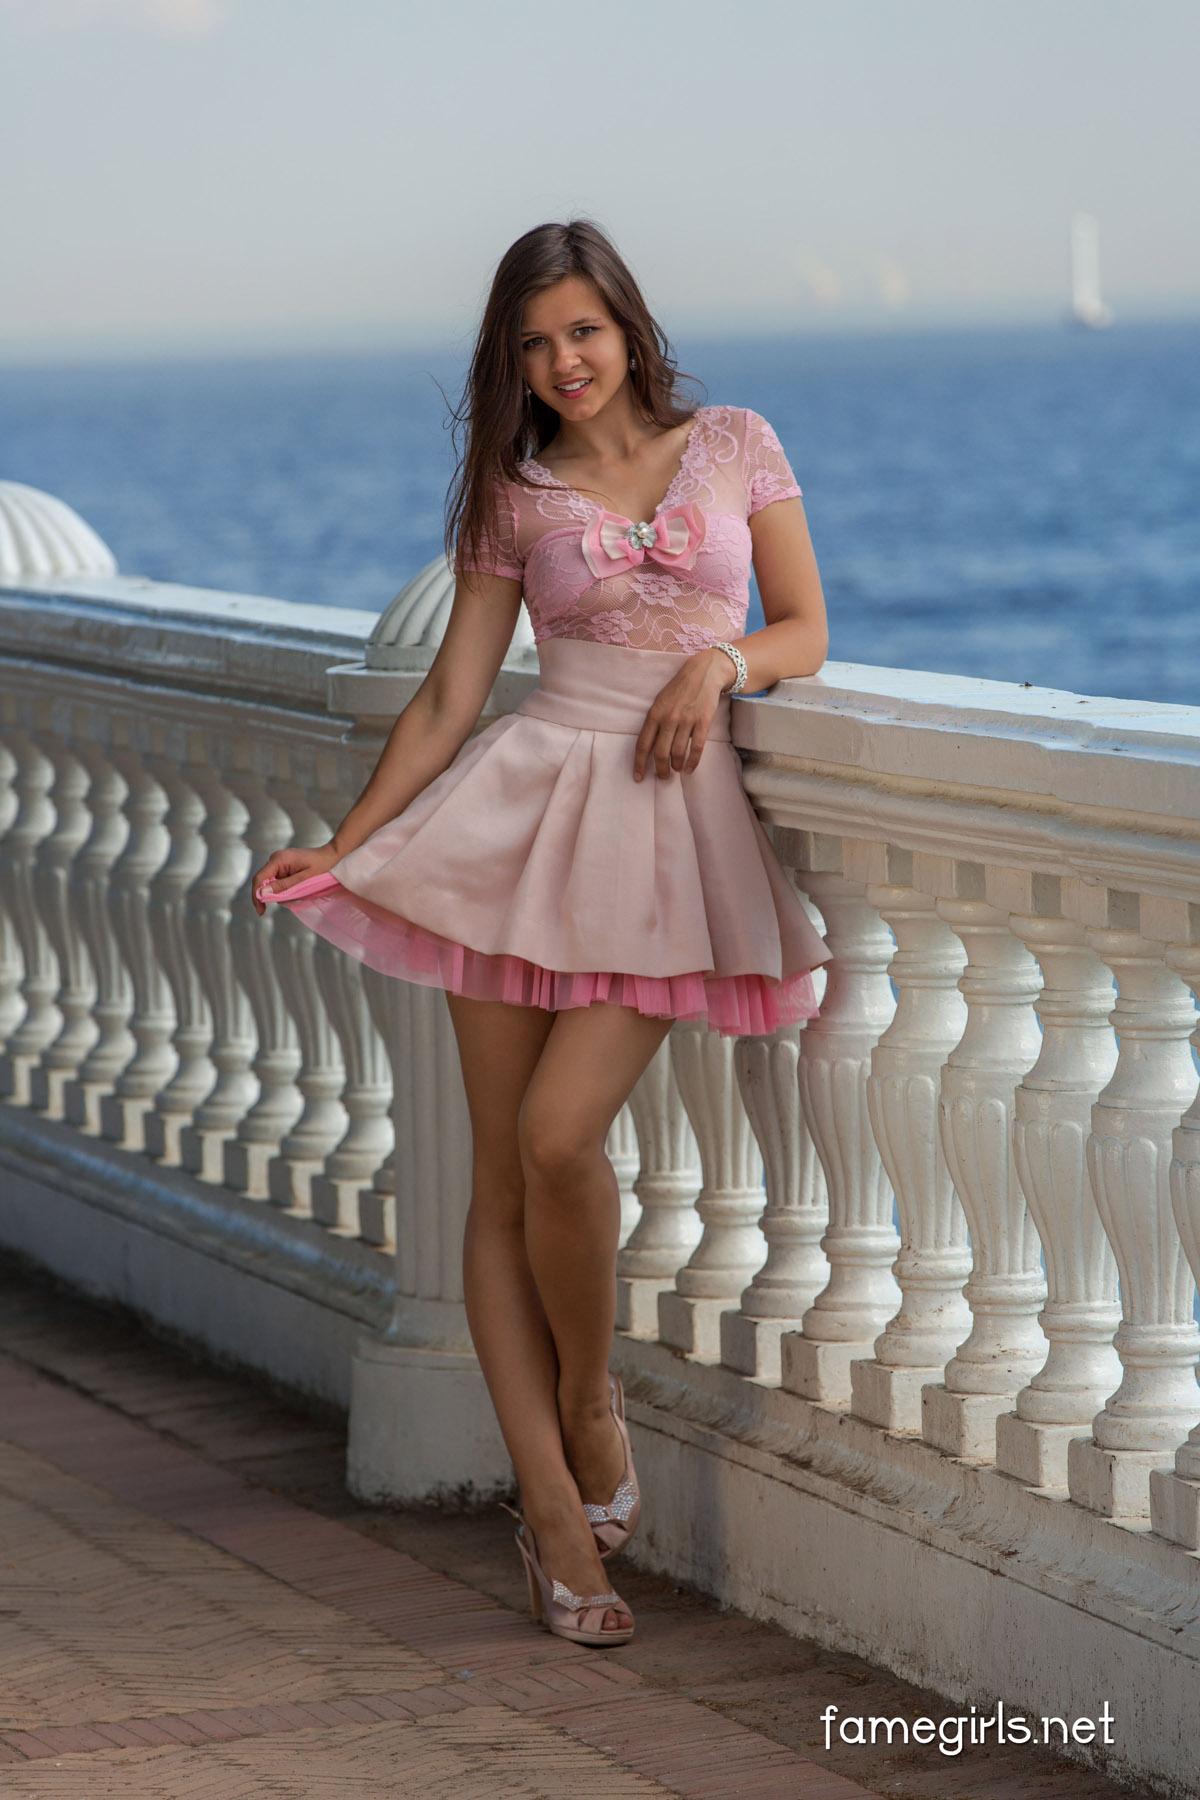 fame teen nude ... Audrey Naughty Princess Fairytale Fame Girl